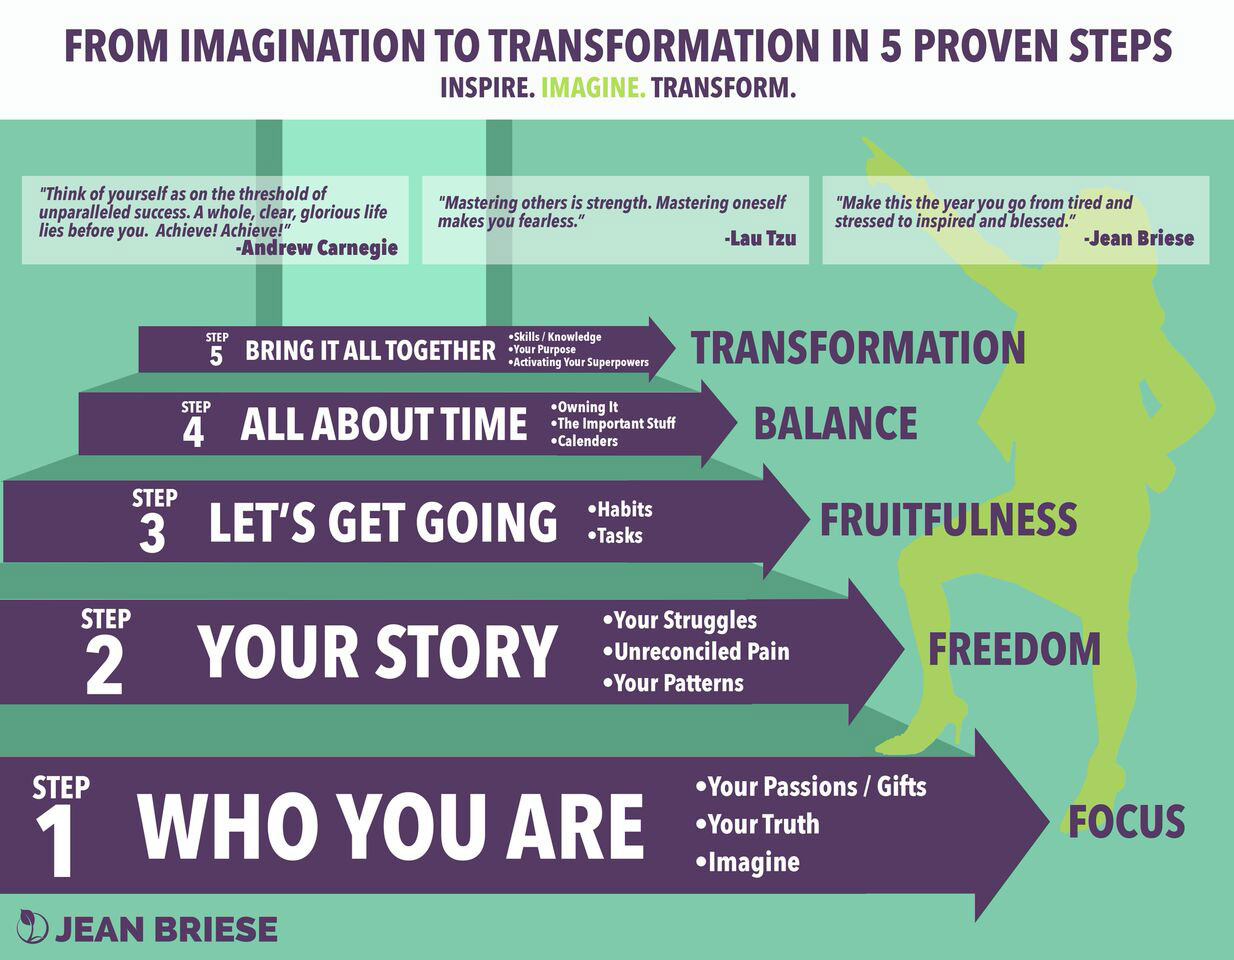 Life coaching phoenix motivational speaker motivational speaker life coaching solutioingenieria Image collections